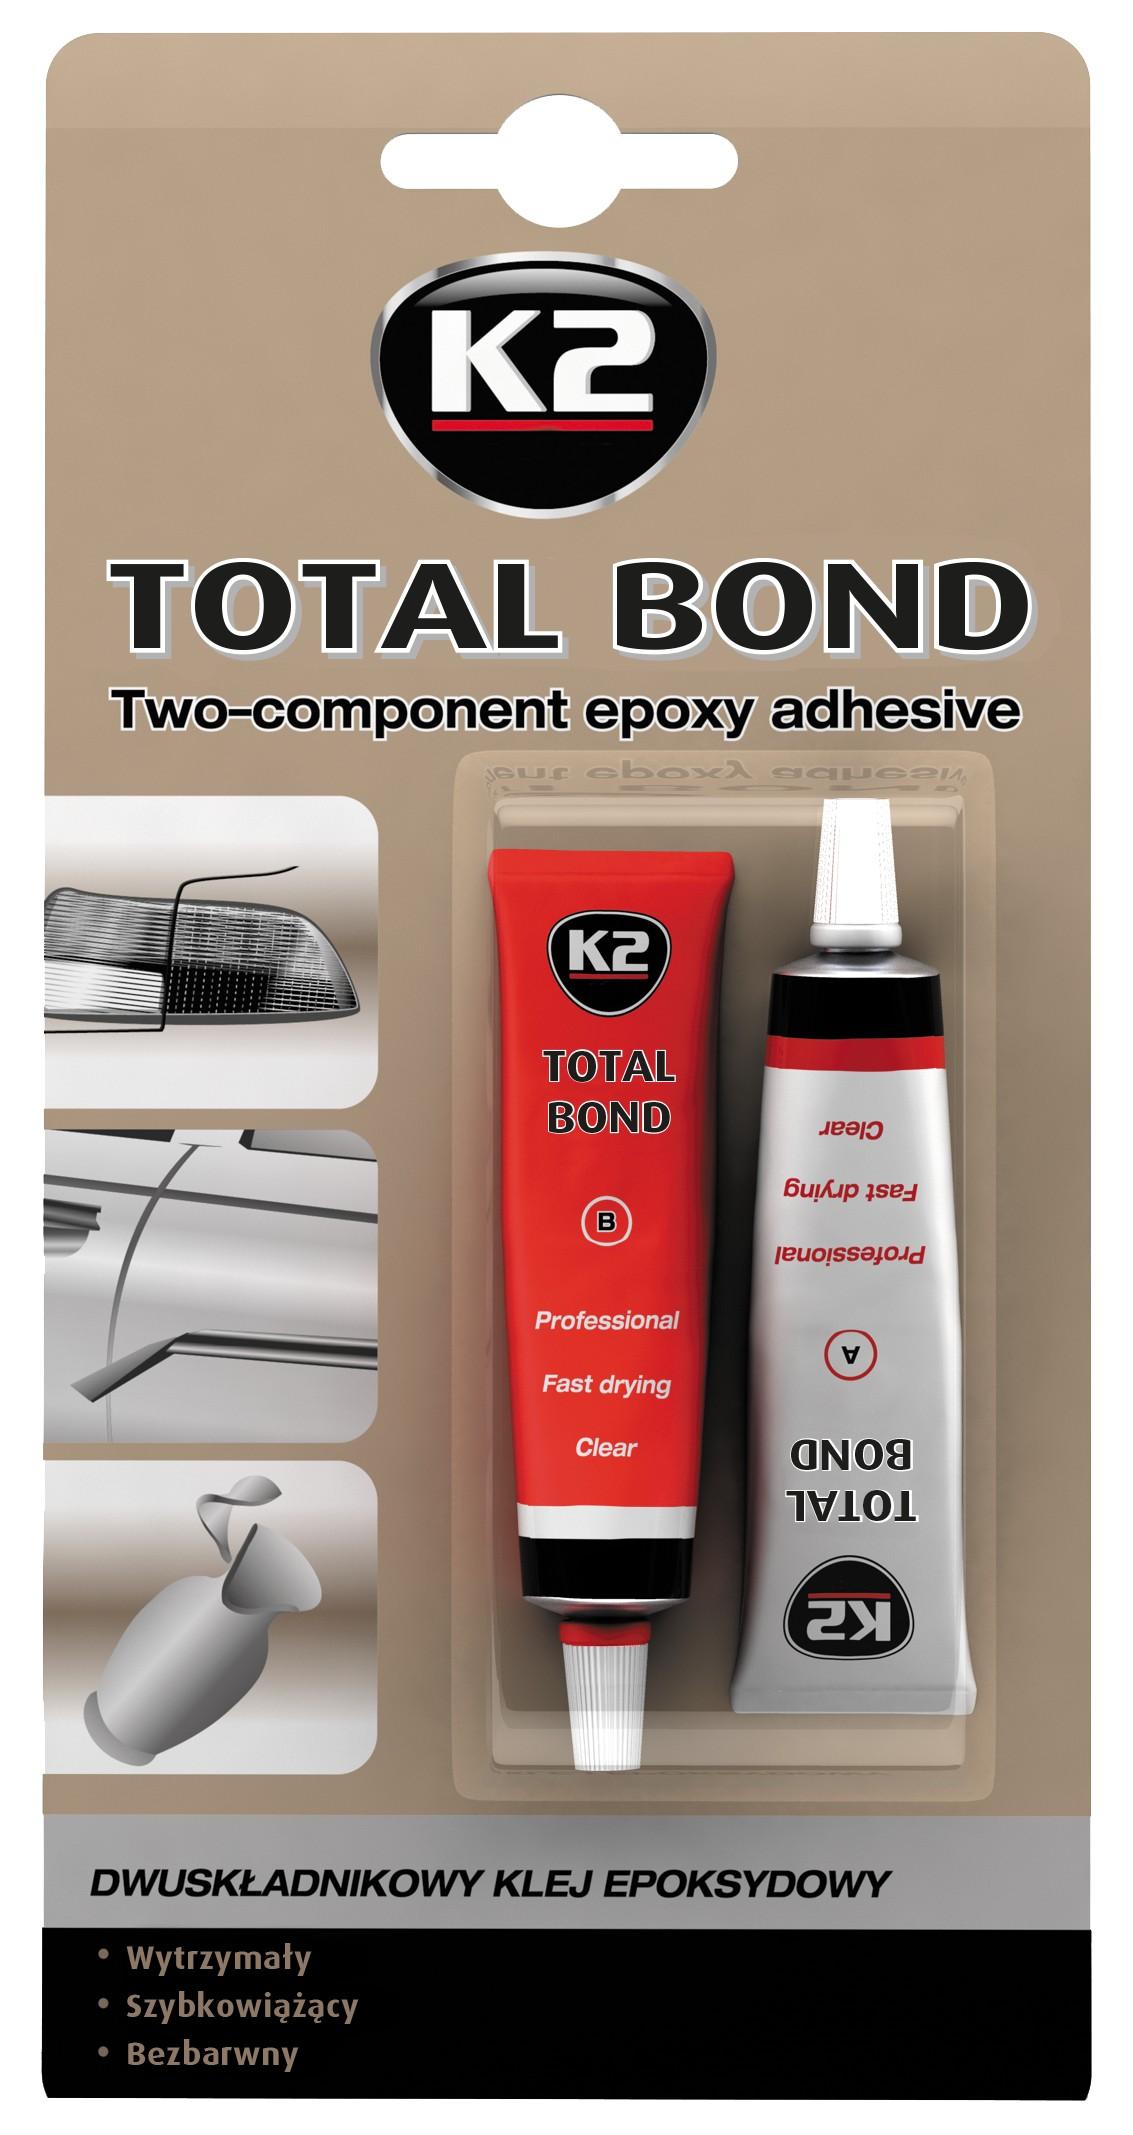 K2 TOTAL BOND